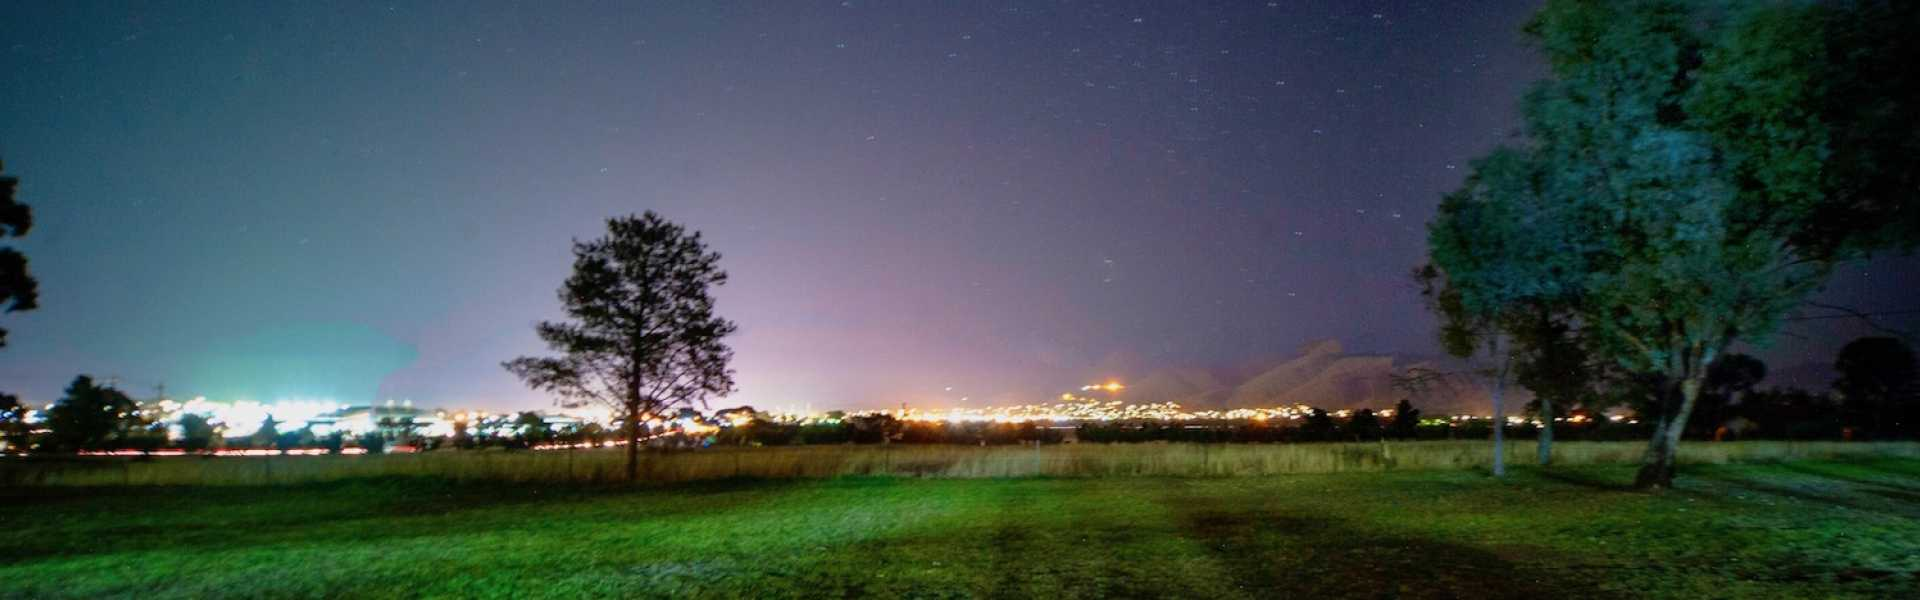 Kui Parks, City Lights Caravan Park, Tamworth, City Lights